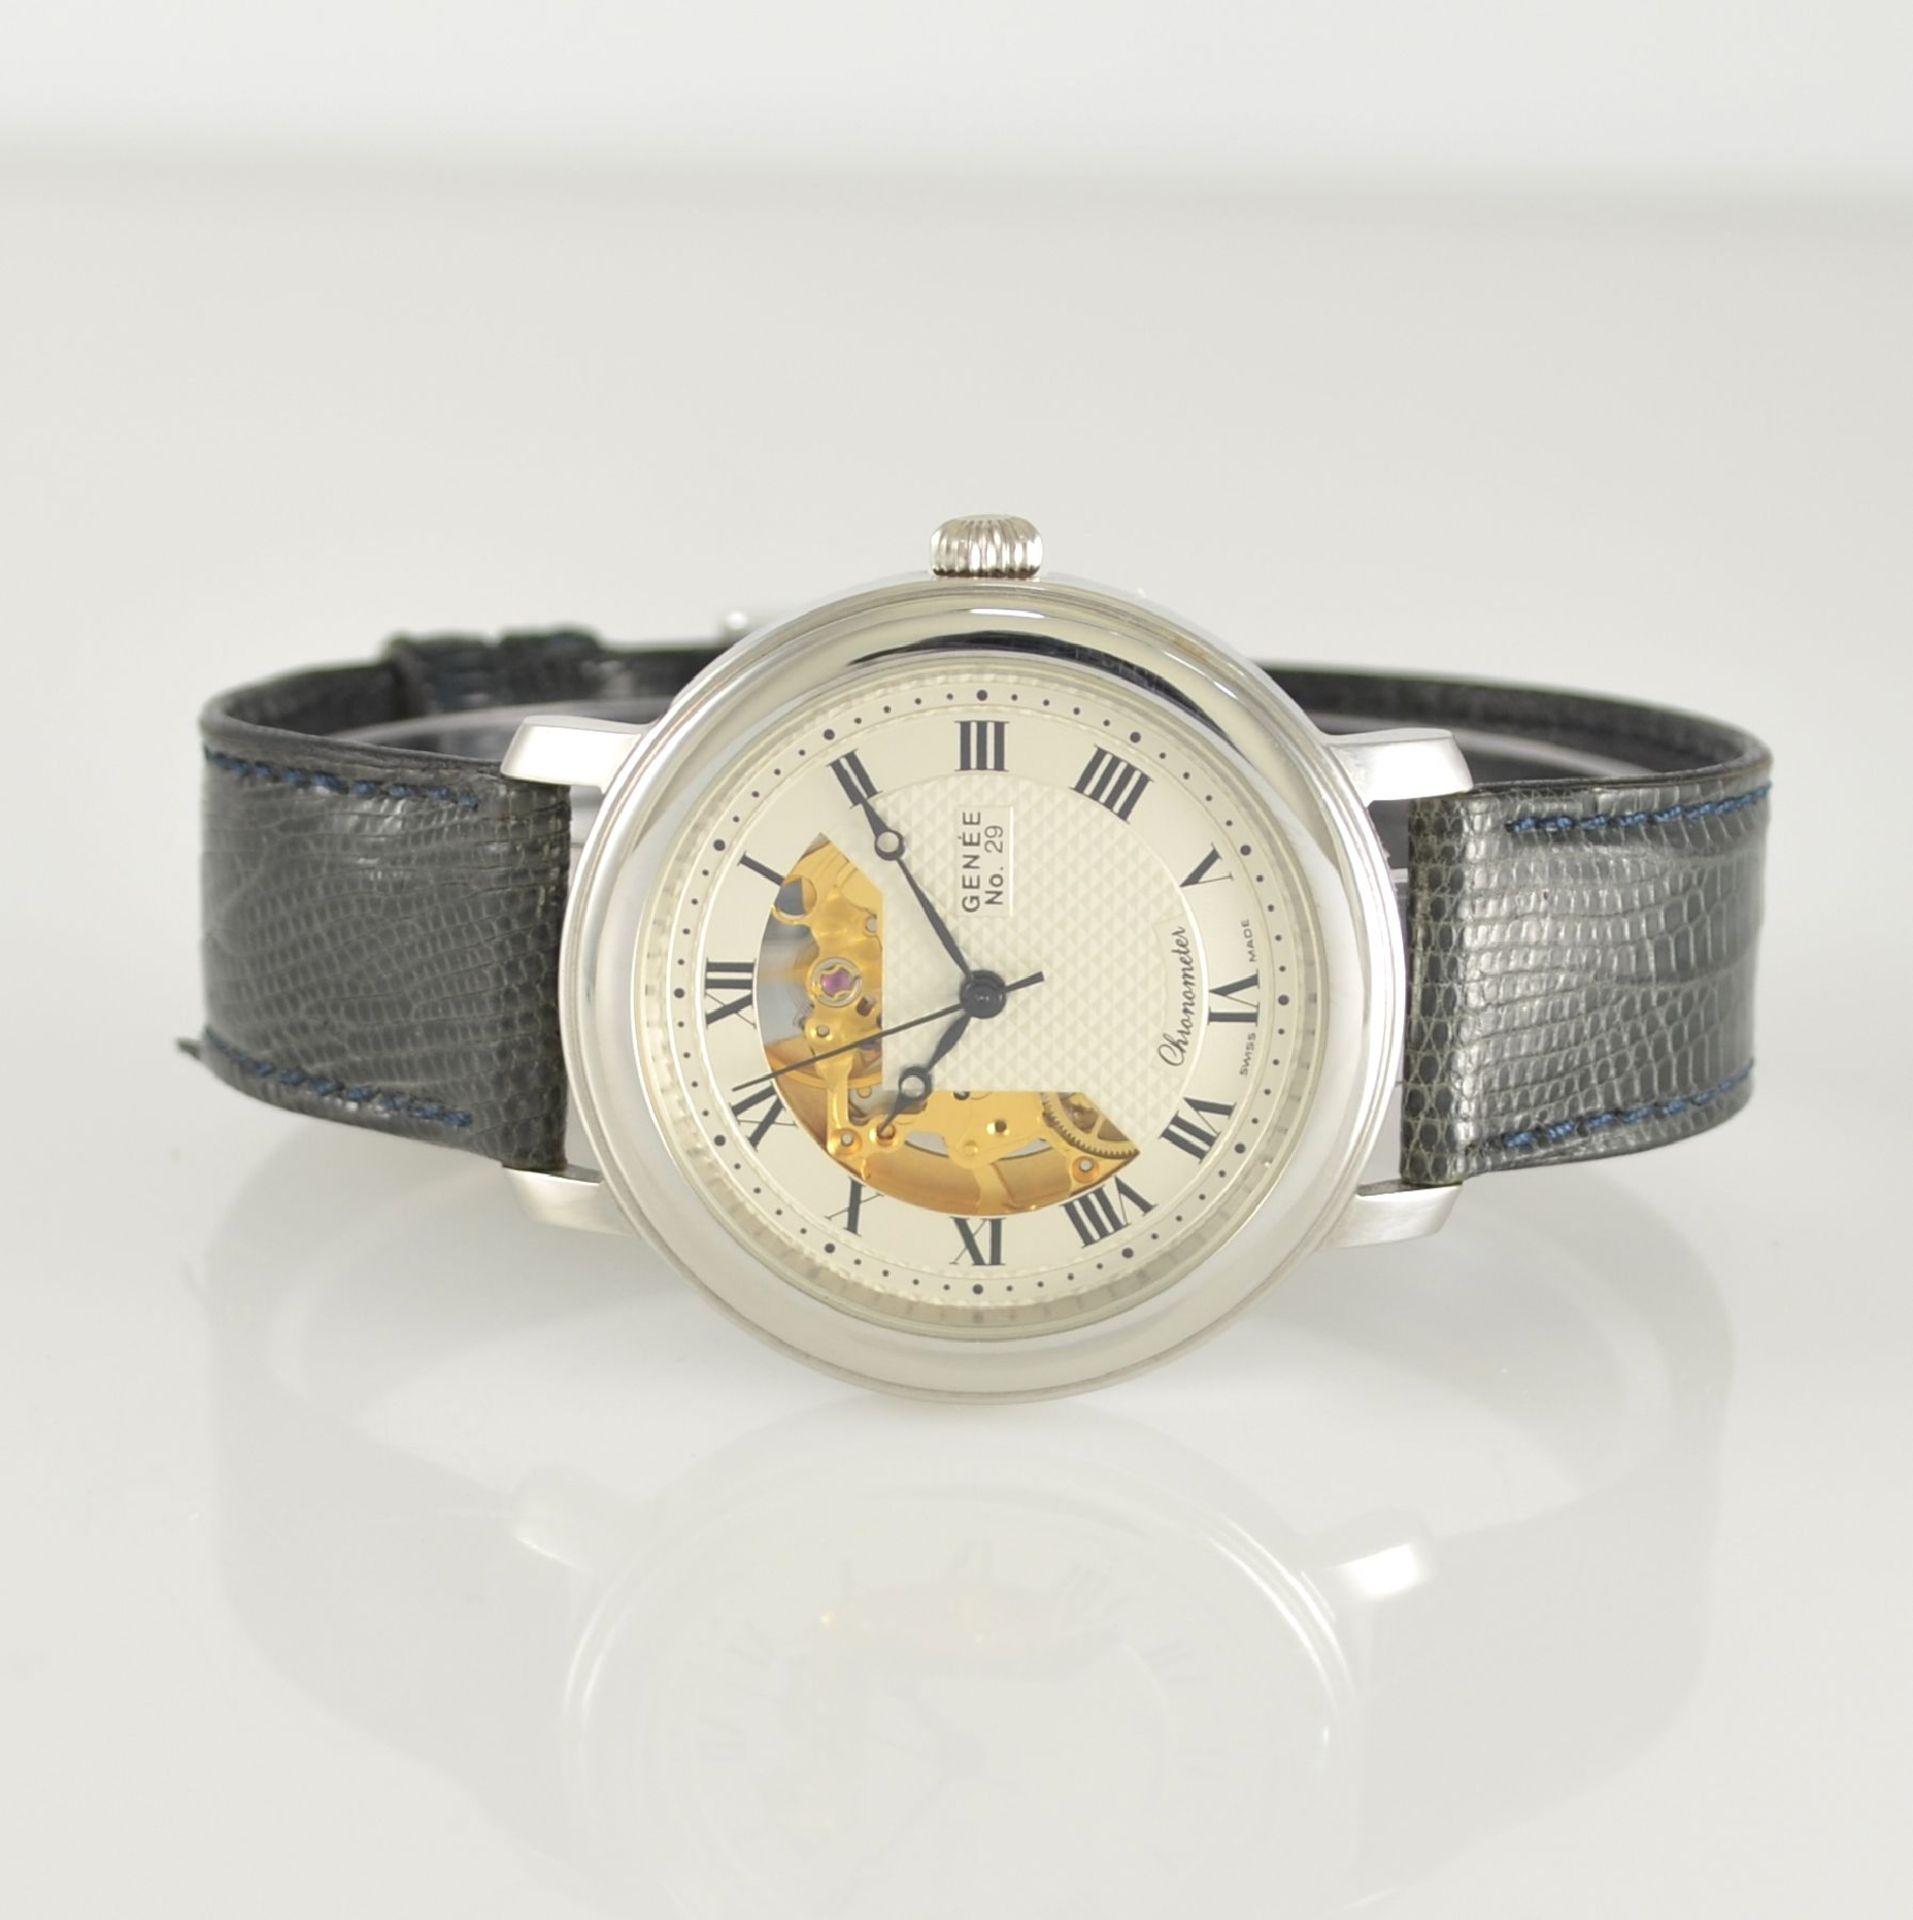 GENÉE No. 29 Chronometer-Herrenarmbanduhr in Stahl, Schweiz lt. beiliegendem Chronometerzertifikat